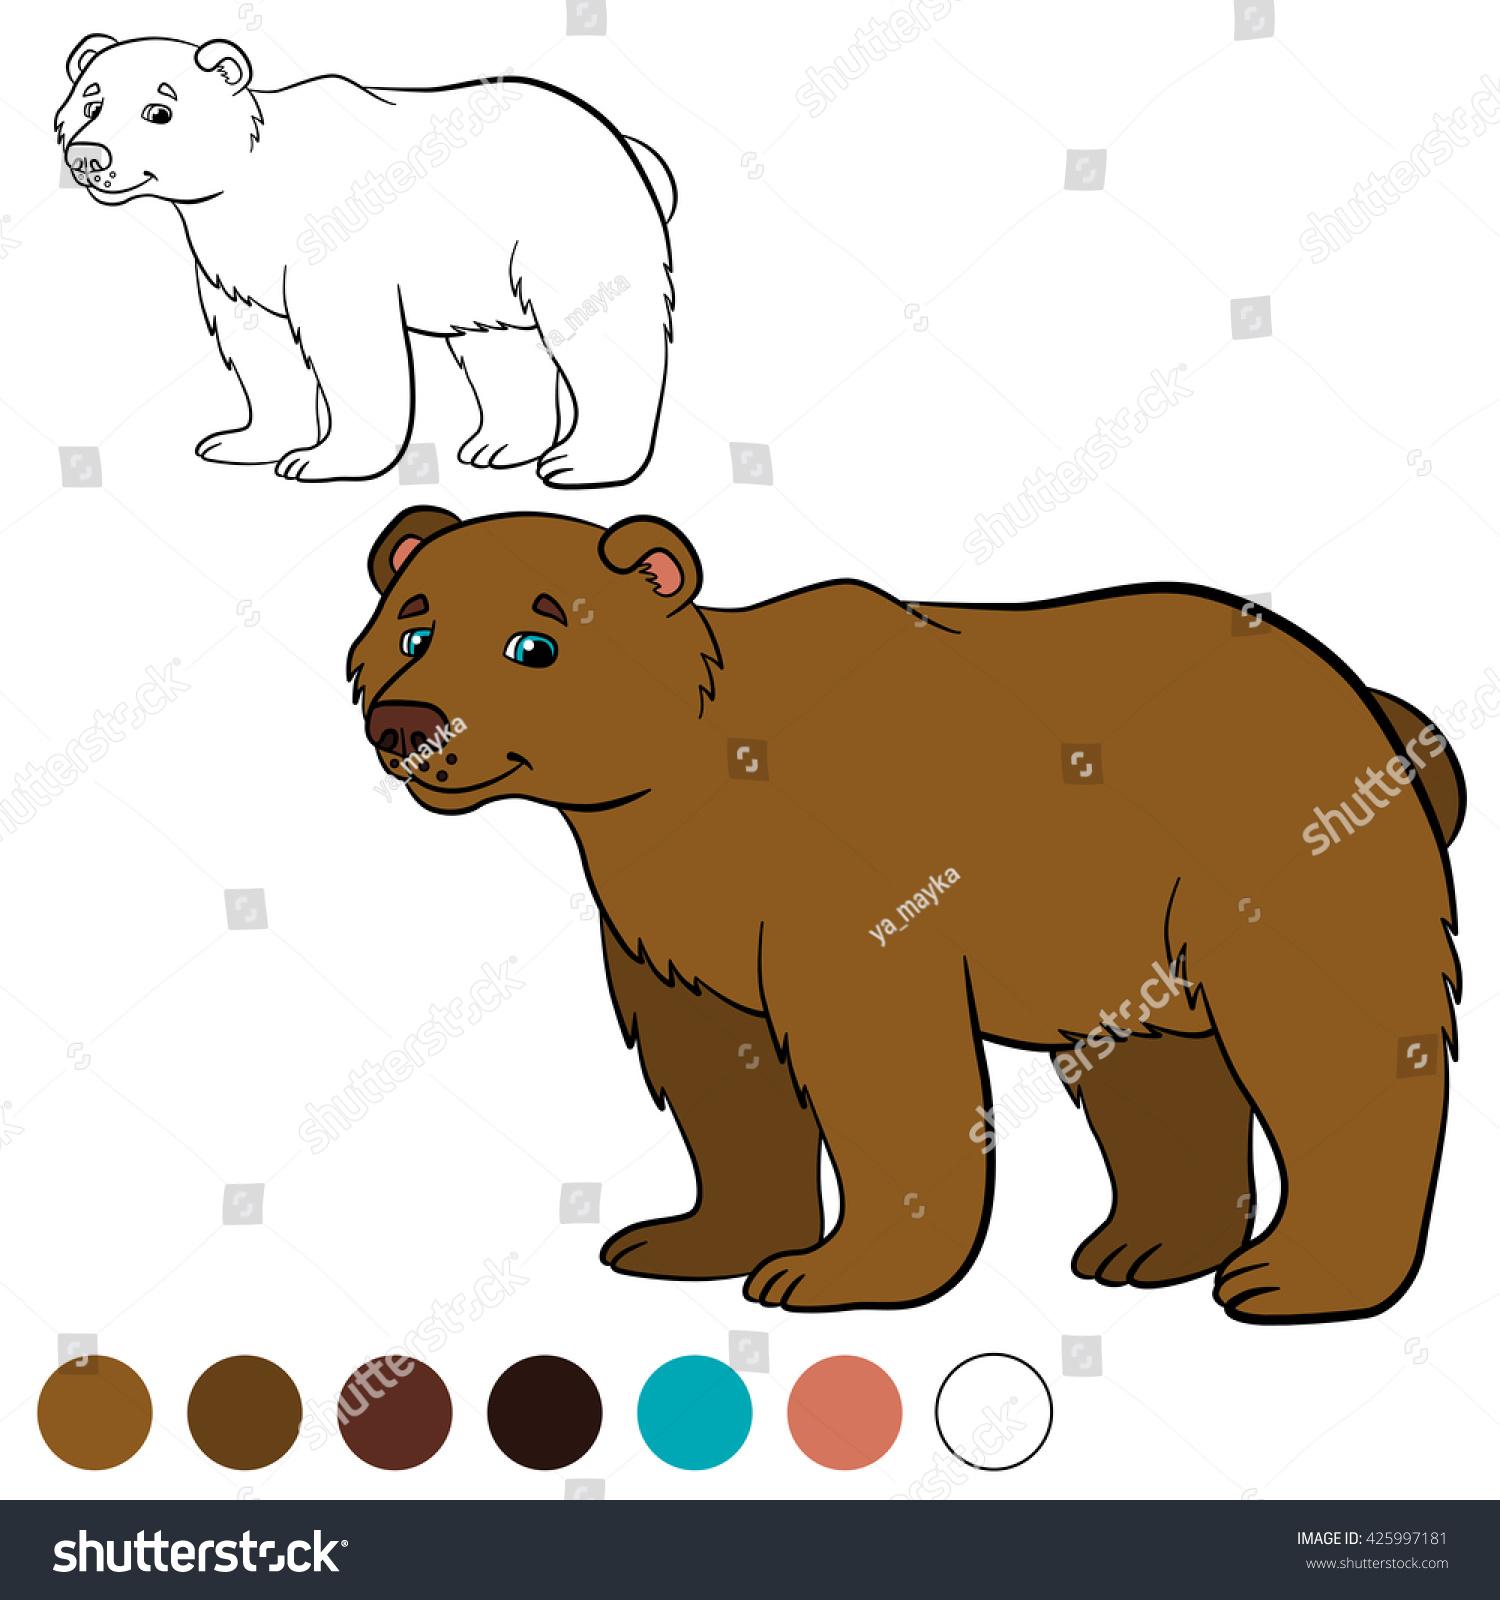 Coloring page. Cute brown bear smiles. | EZ Canvas